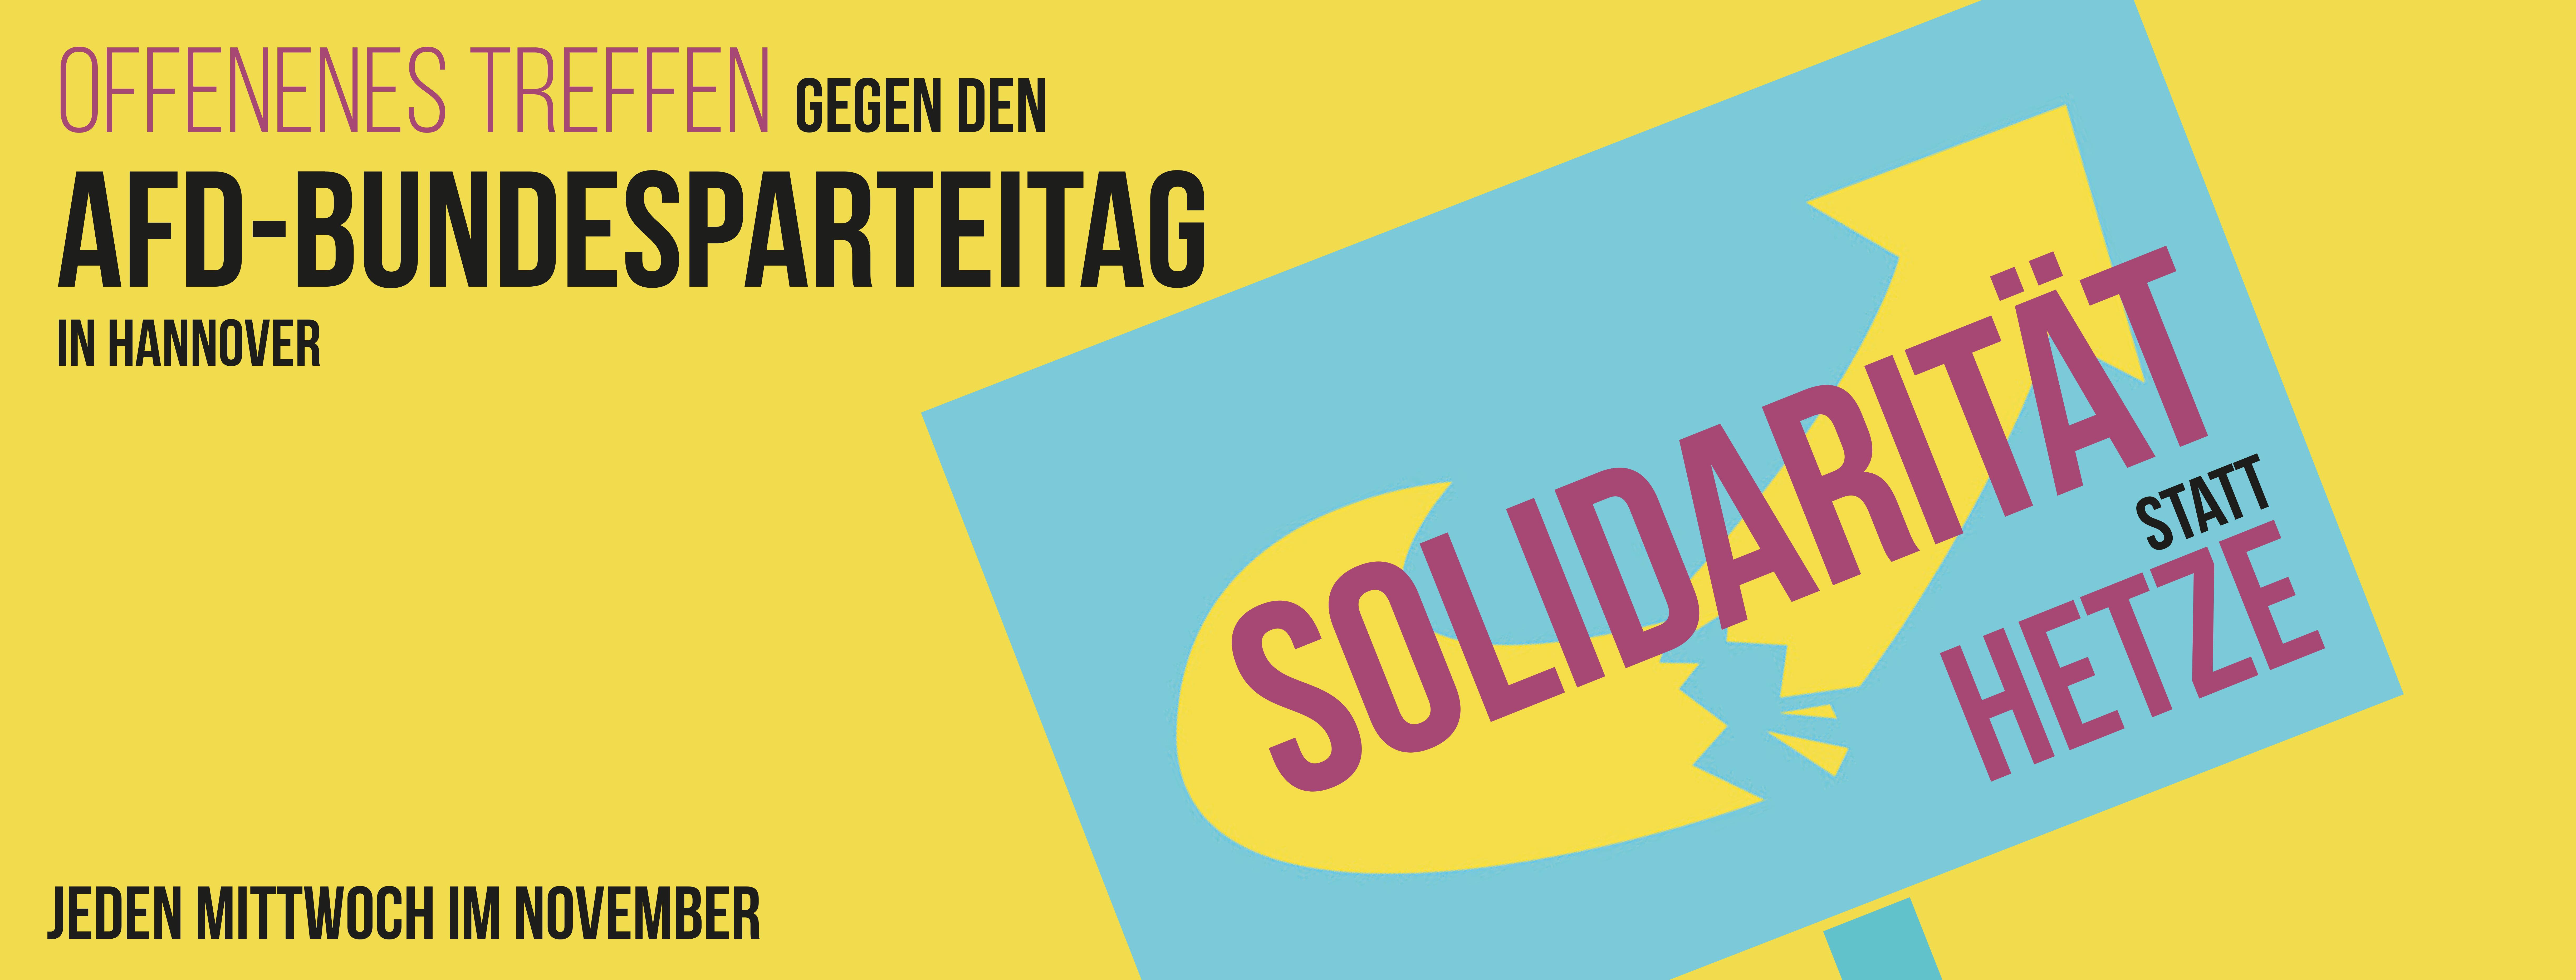 Offenes Treffen: Gegen den AfD-Bundesparteitag in Hannover